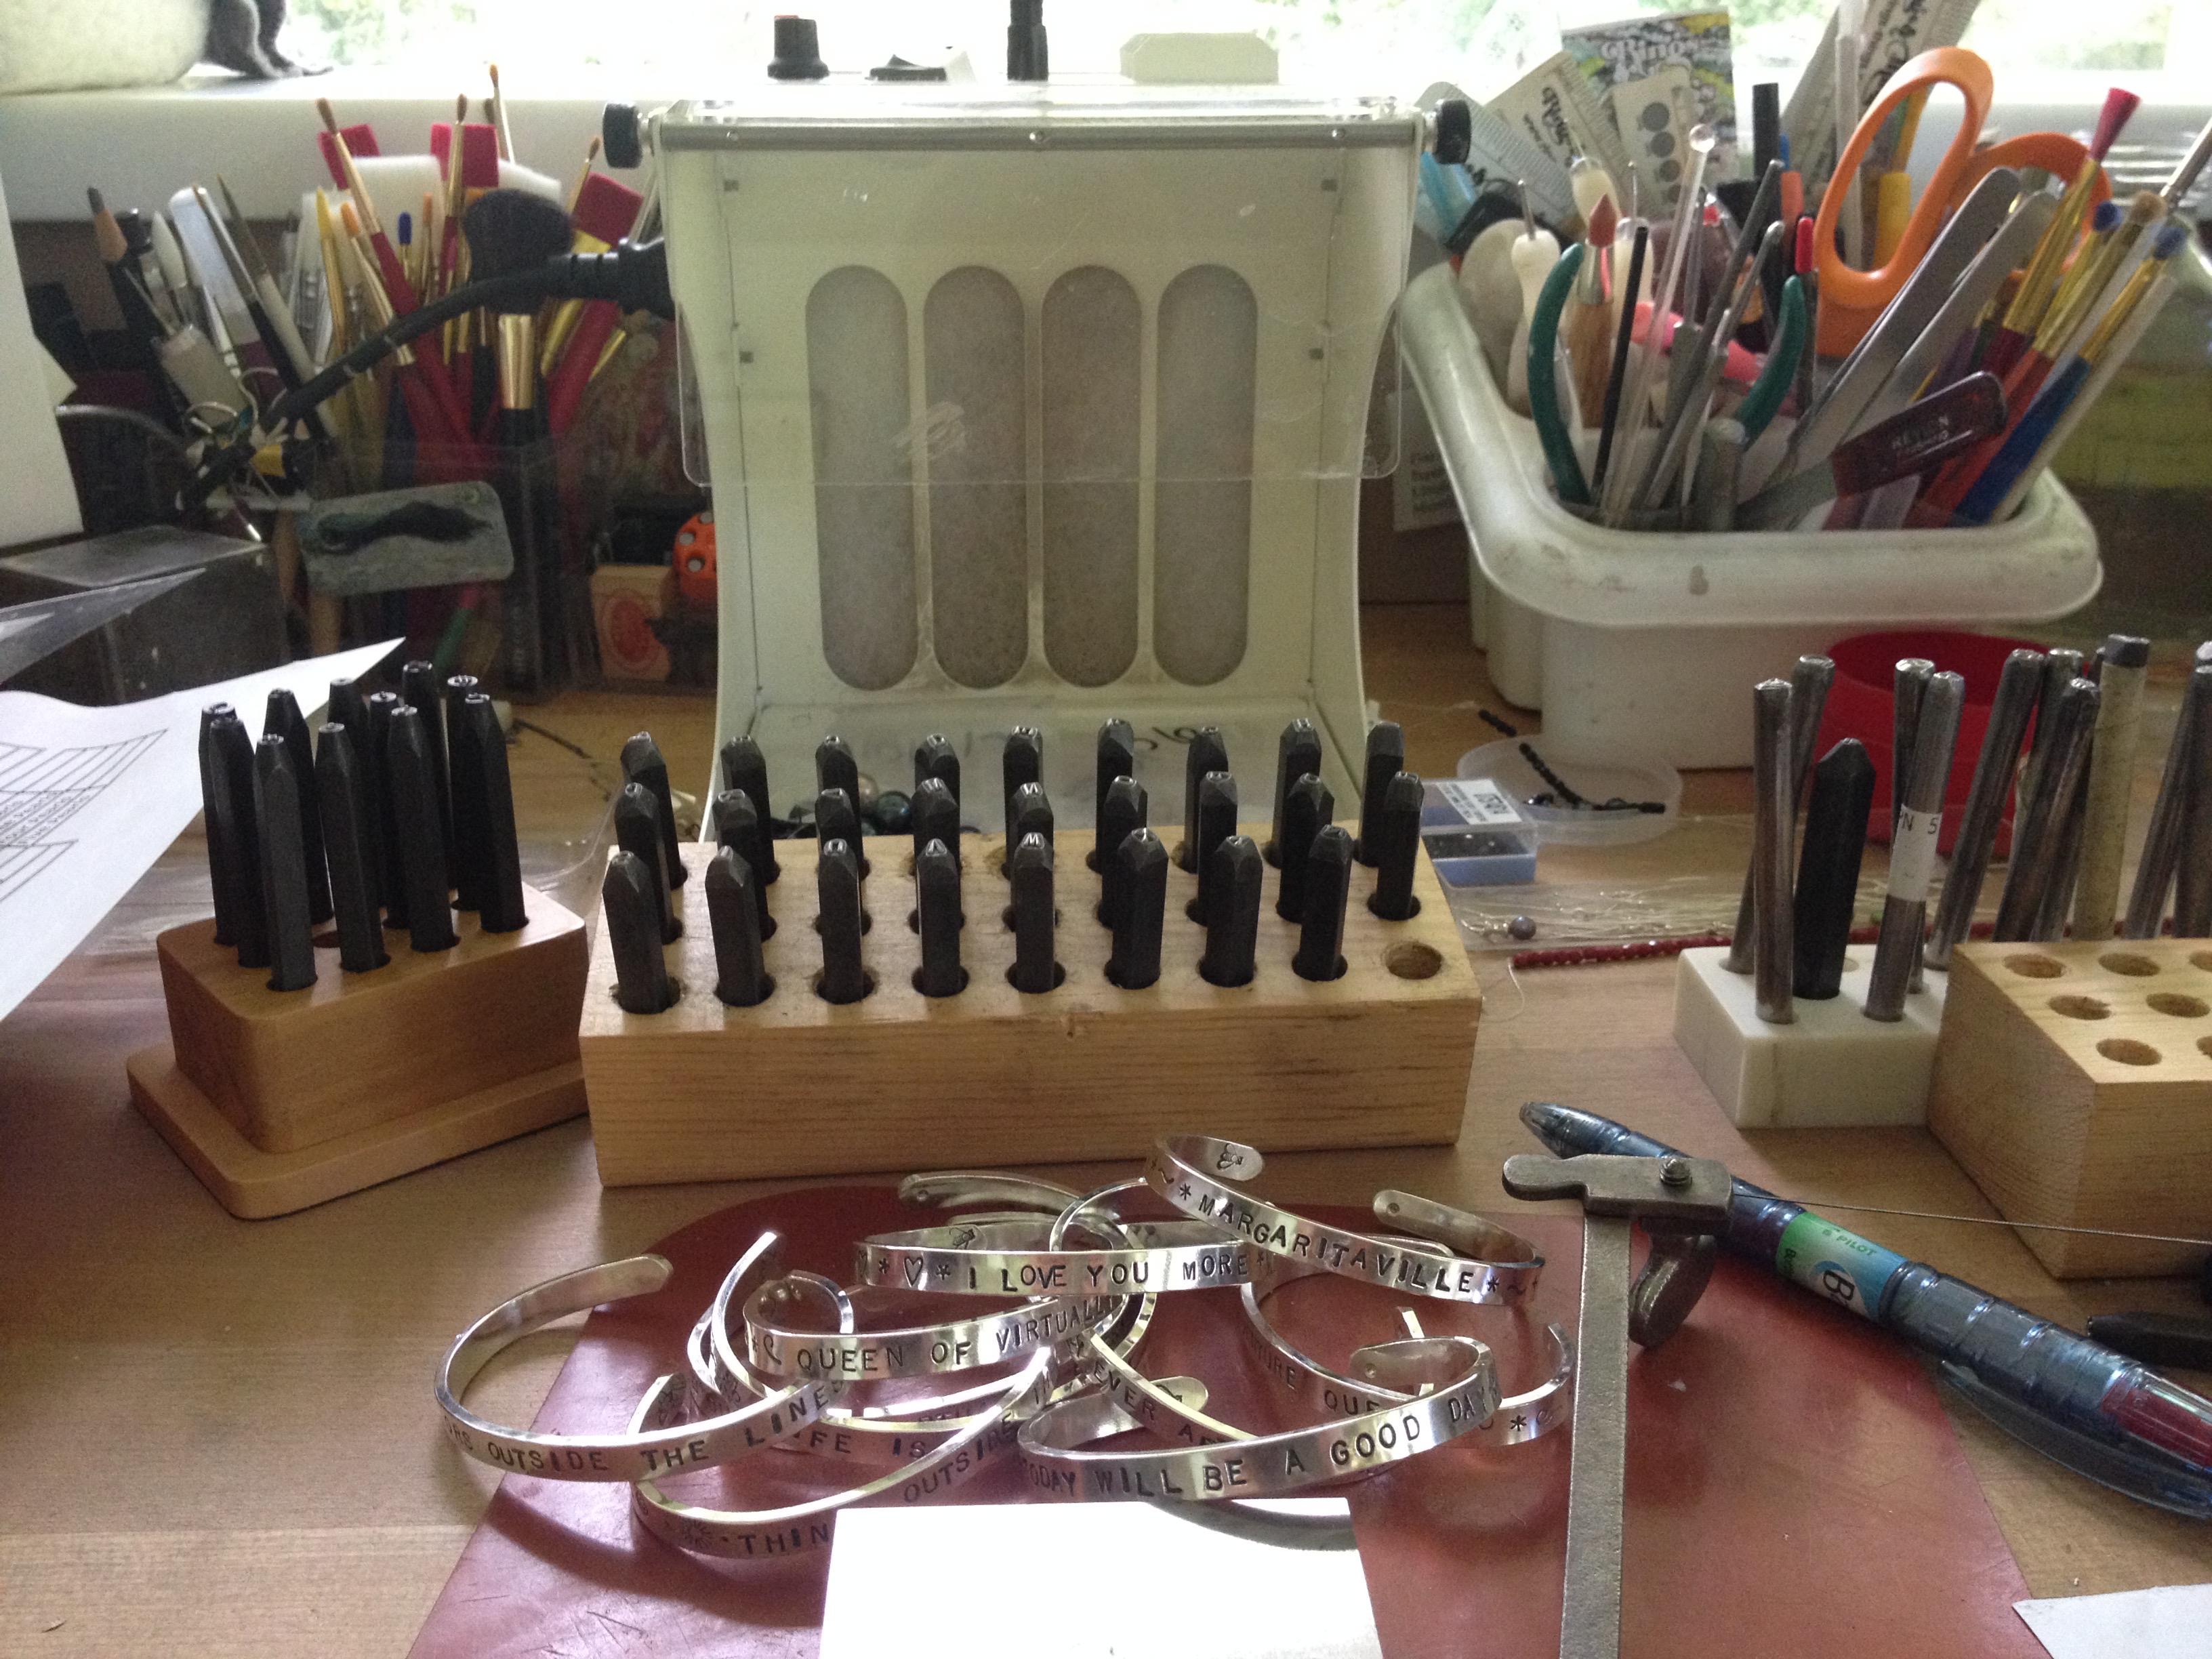 Pile of Bracelets